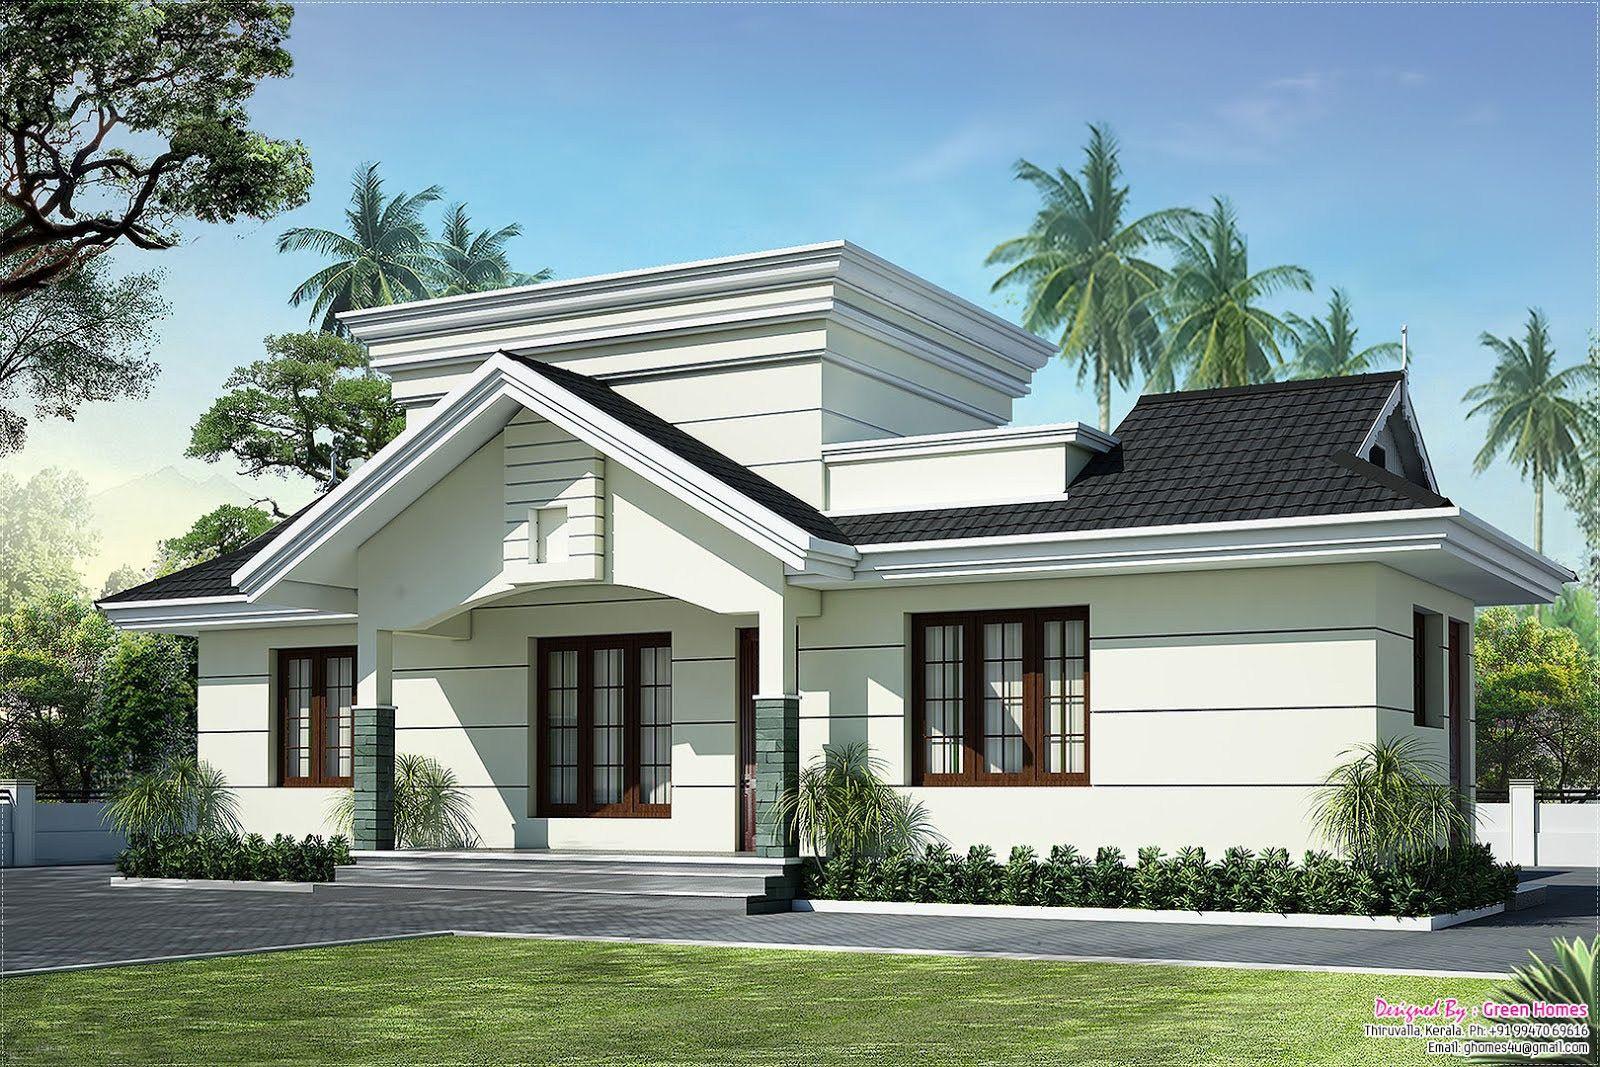 196eb97b5230015c598cbc79d83ee56b sq ft apartment floor plan sq ft floor plans english cottage,English Style Home Design